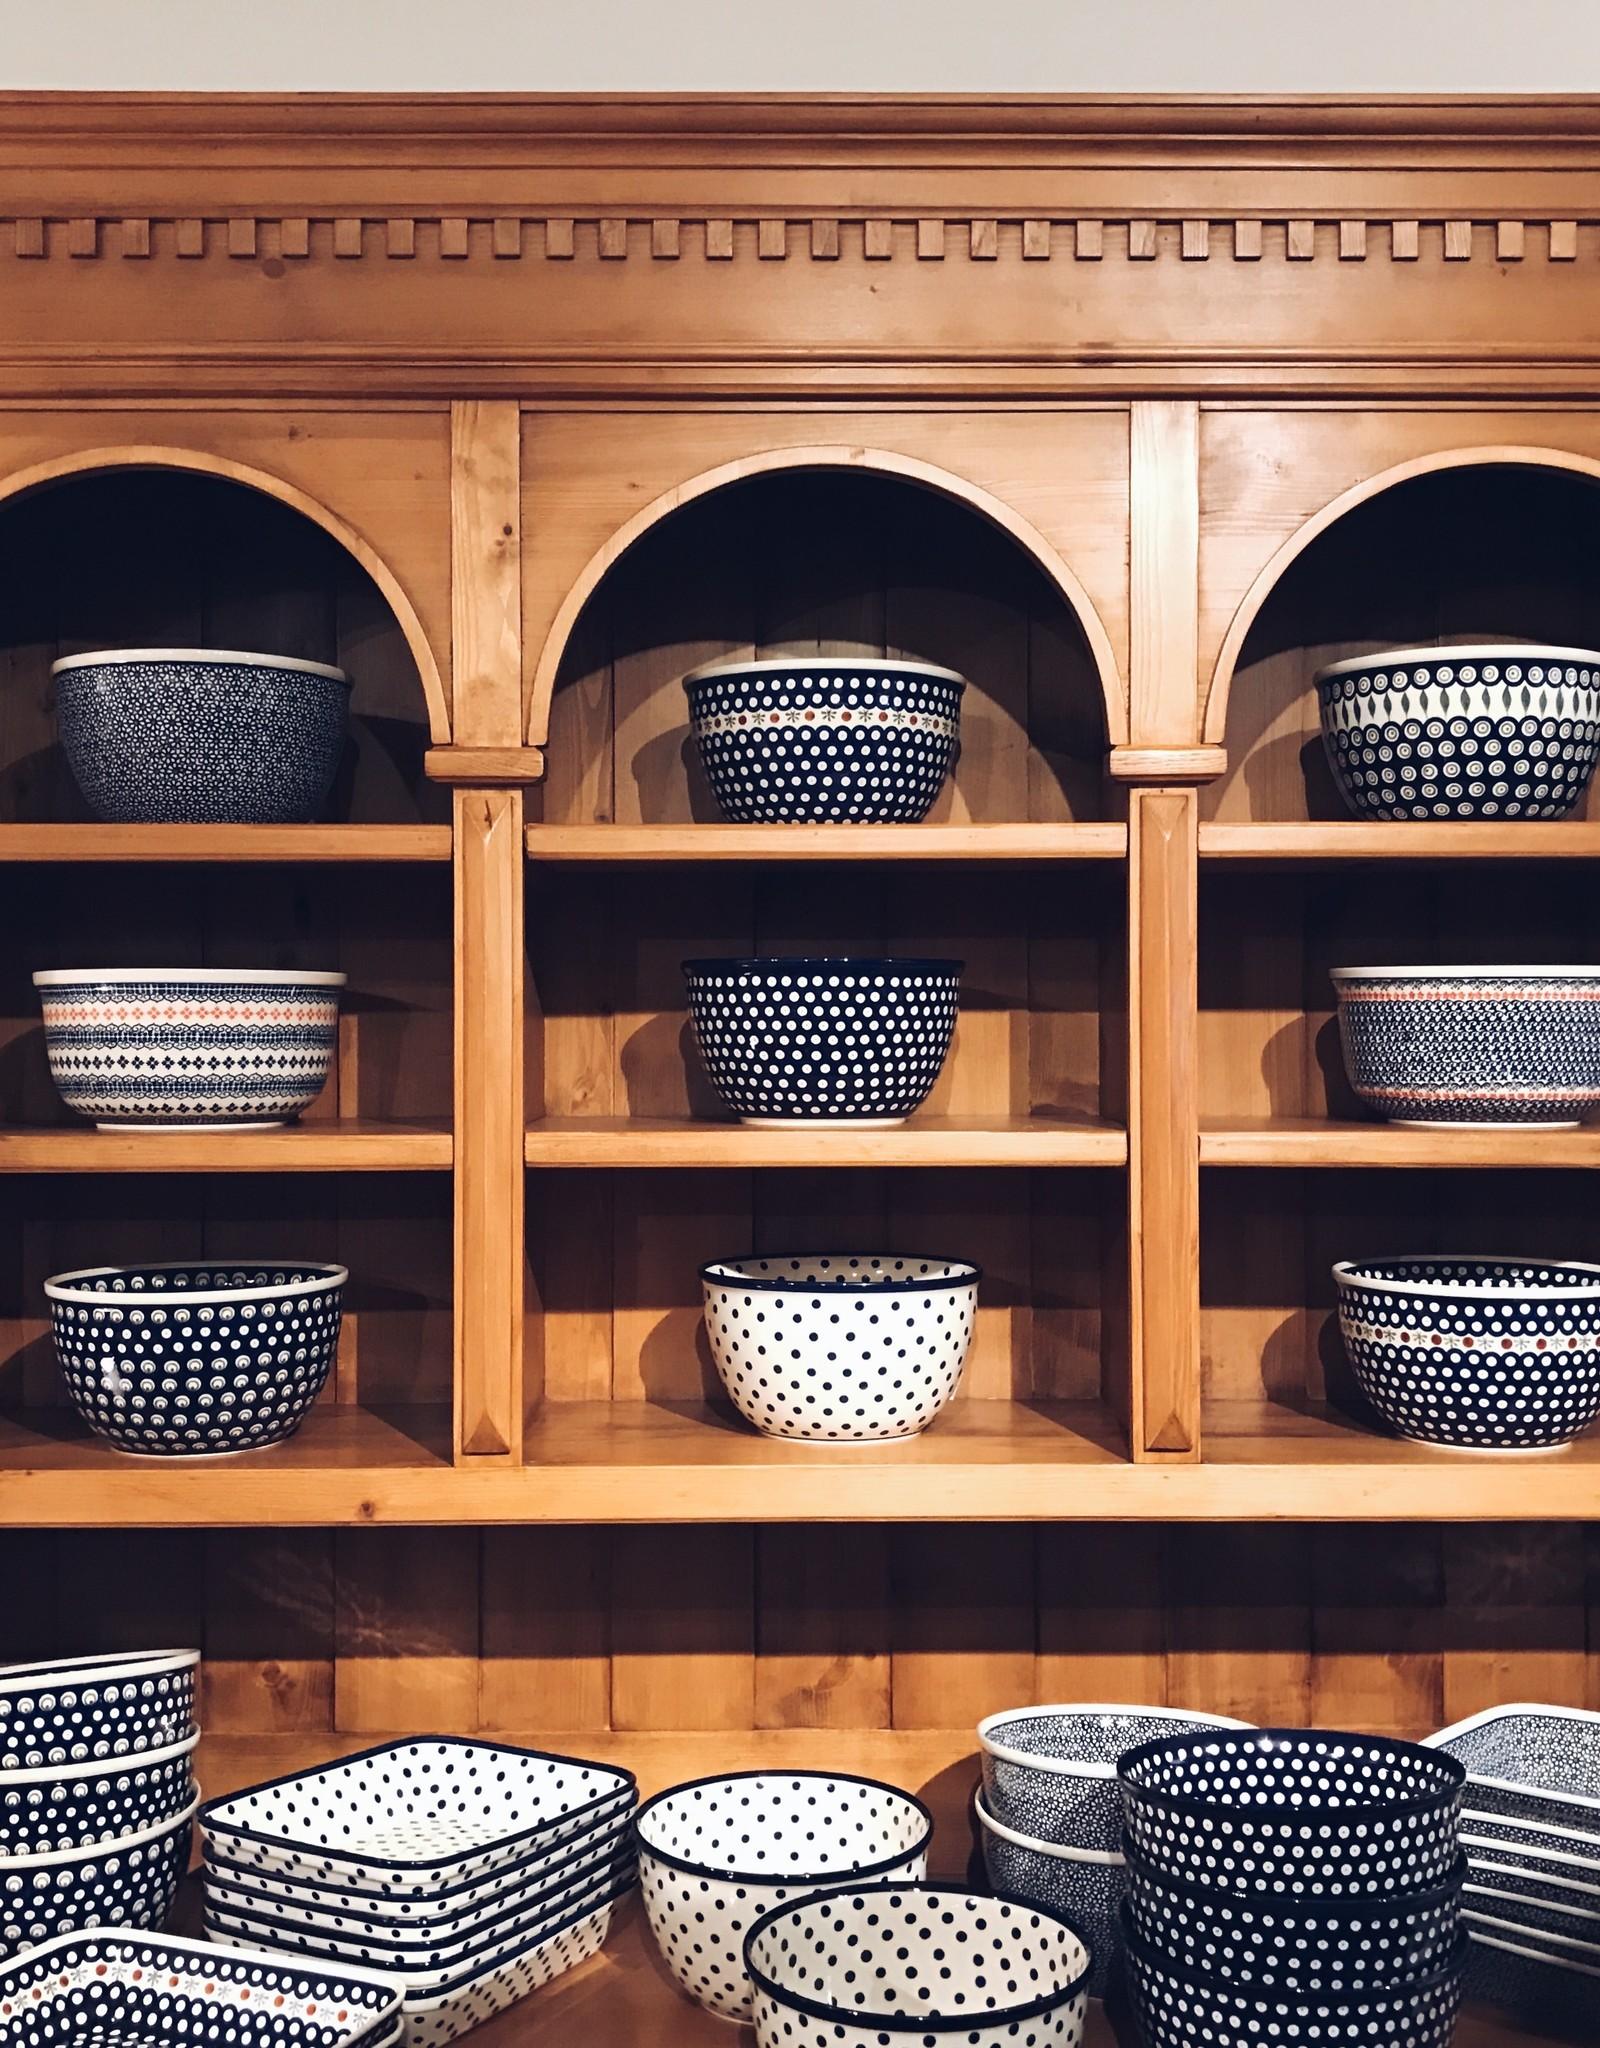 Polish Pottery Casserole Large - Blue Dots (Blue Rim)